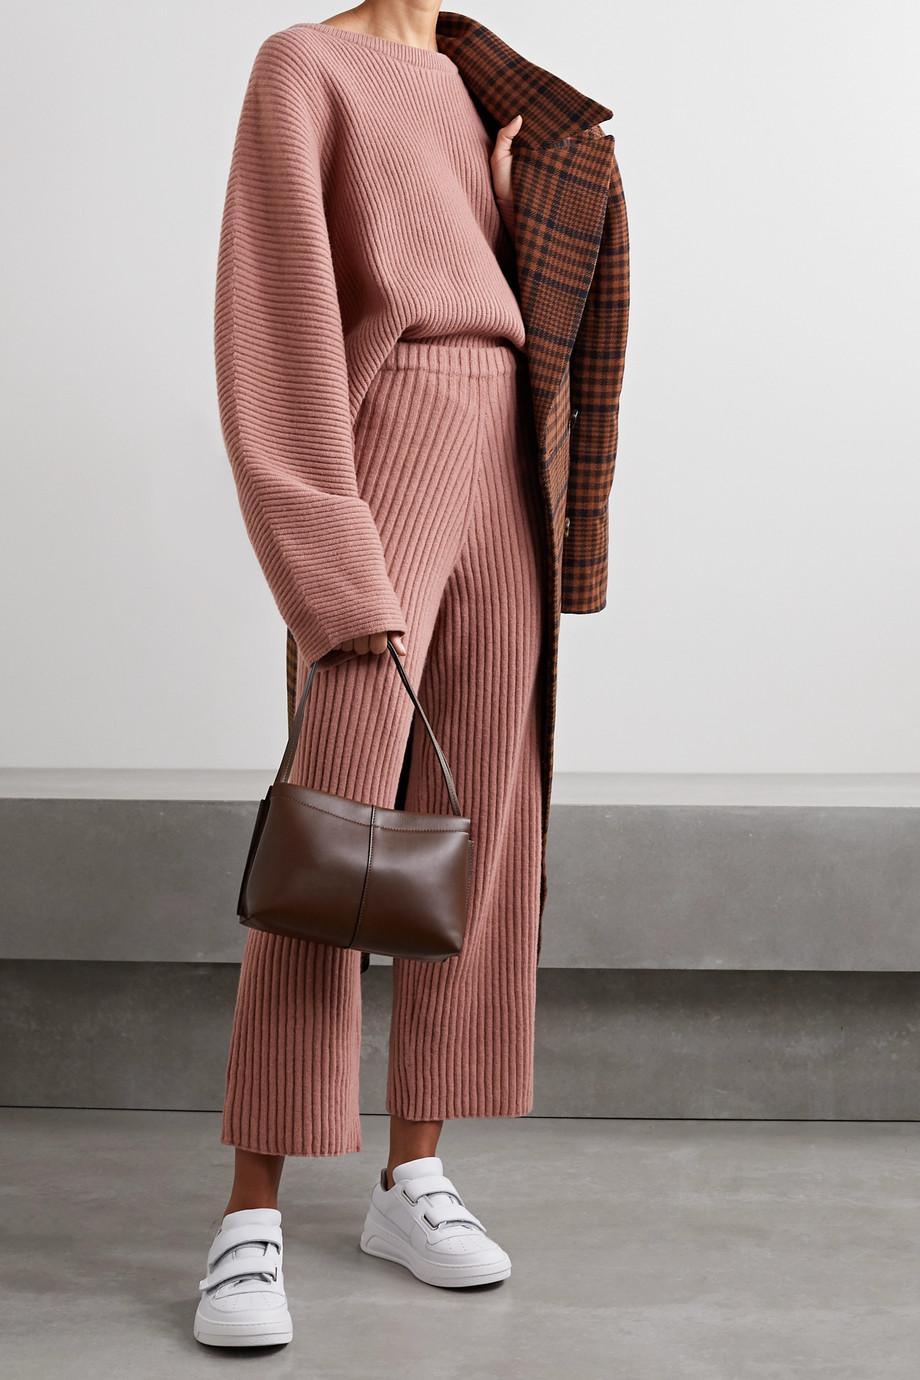 Baserange Kai gerippter Pullover aus Merinowolle